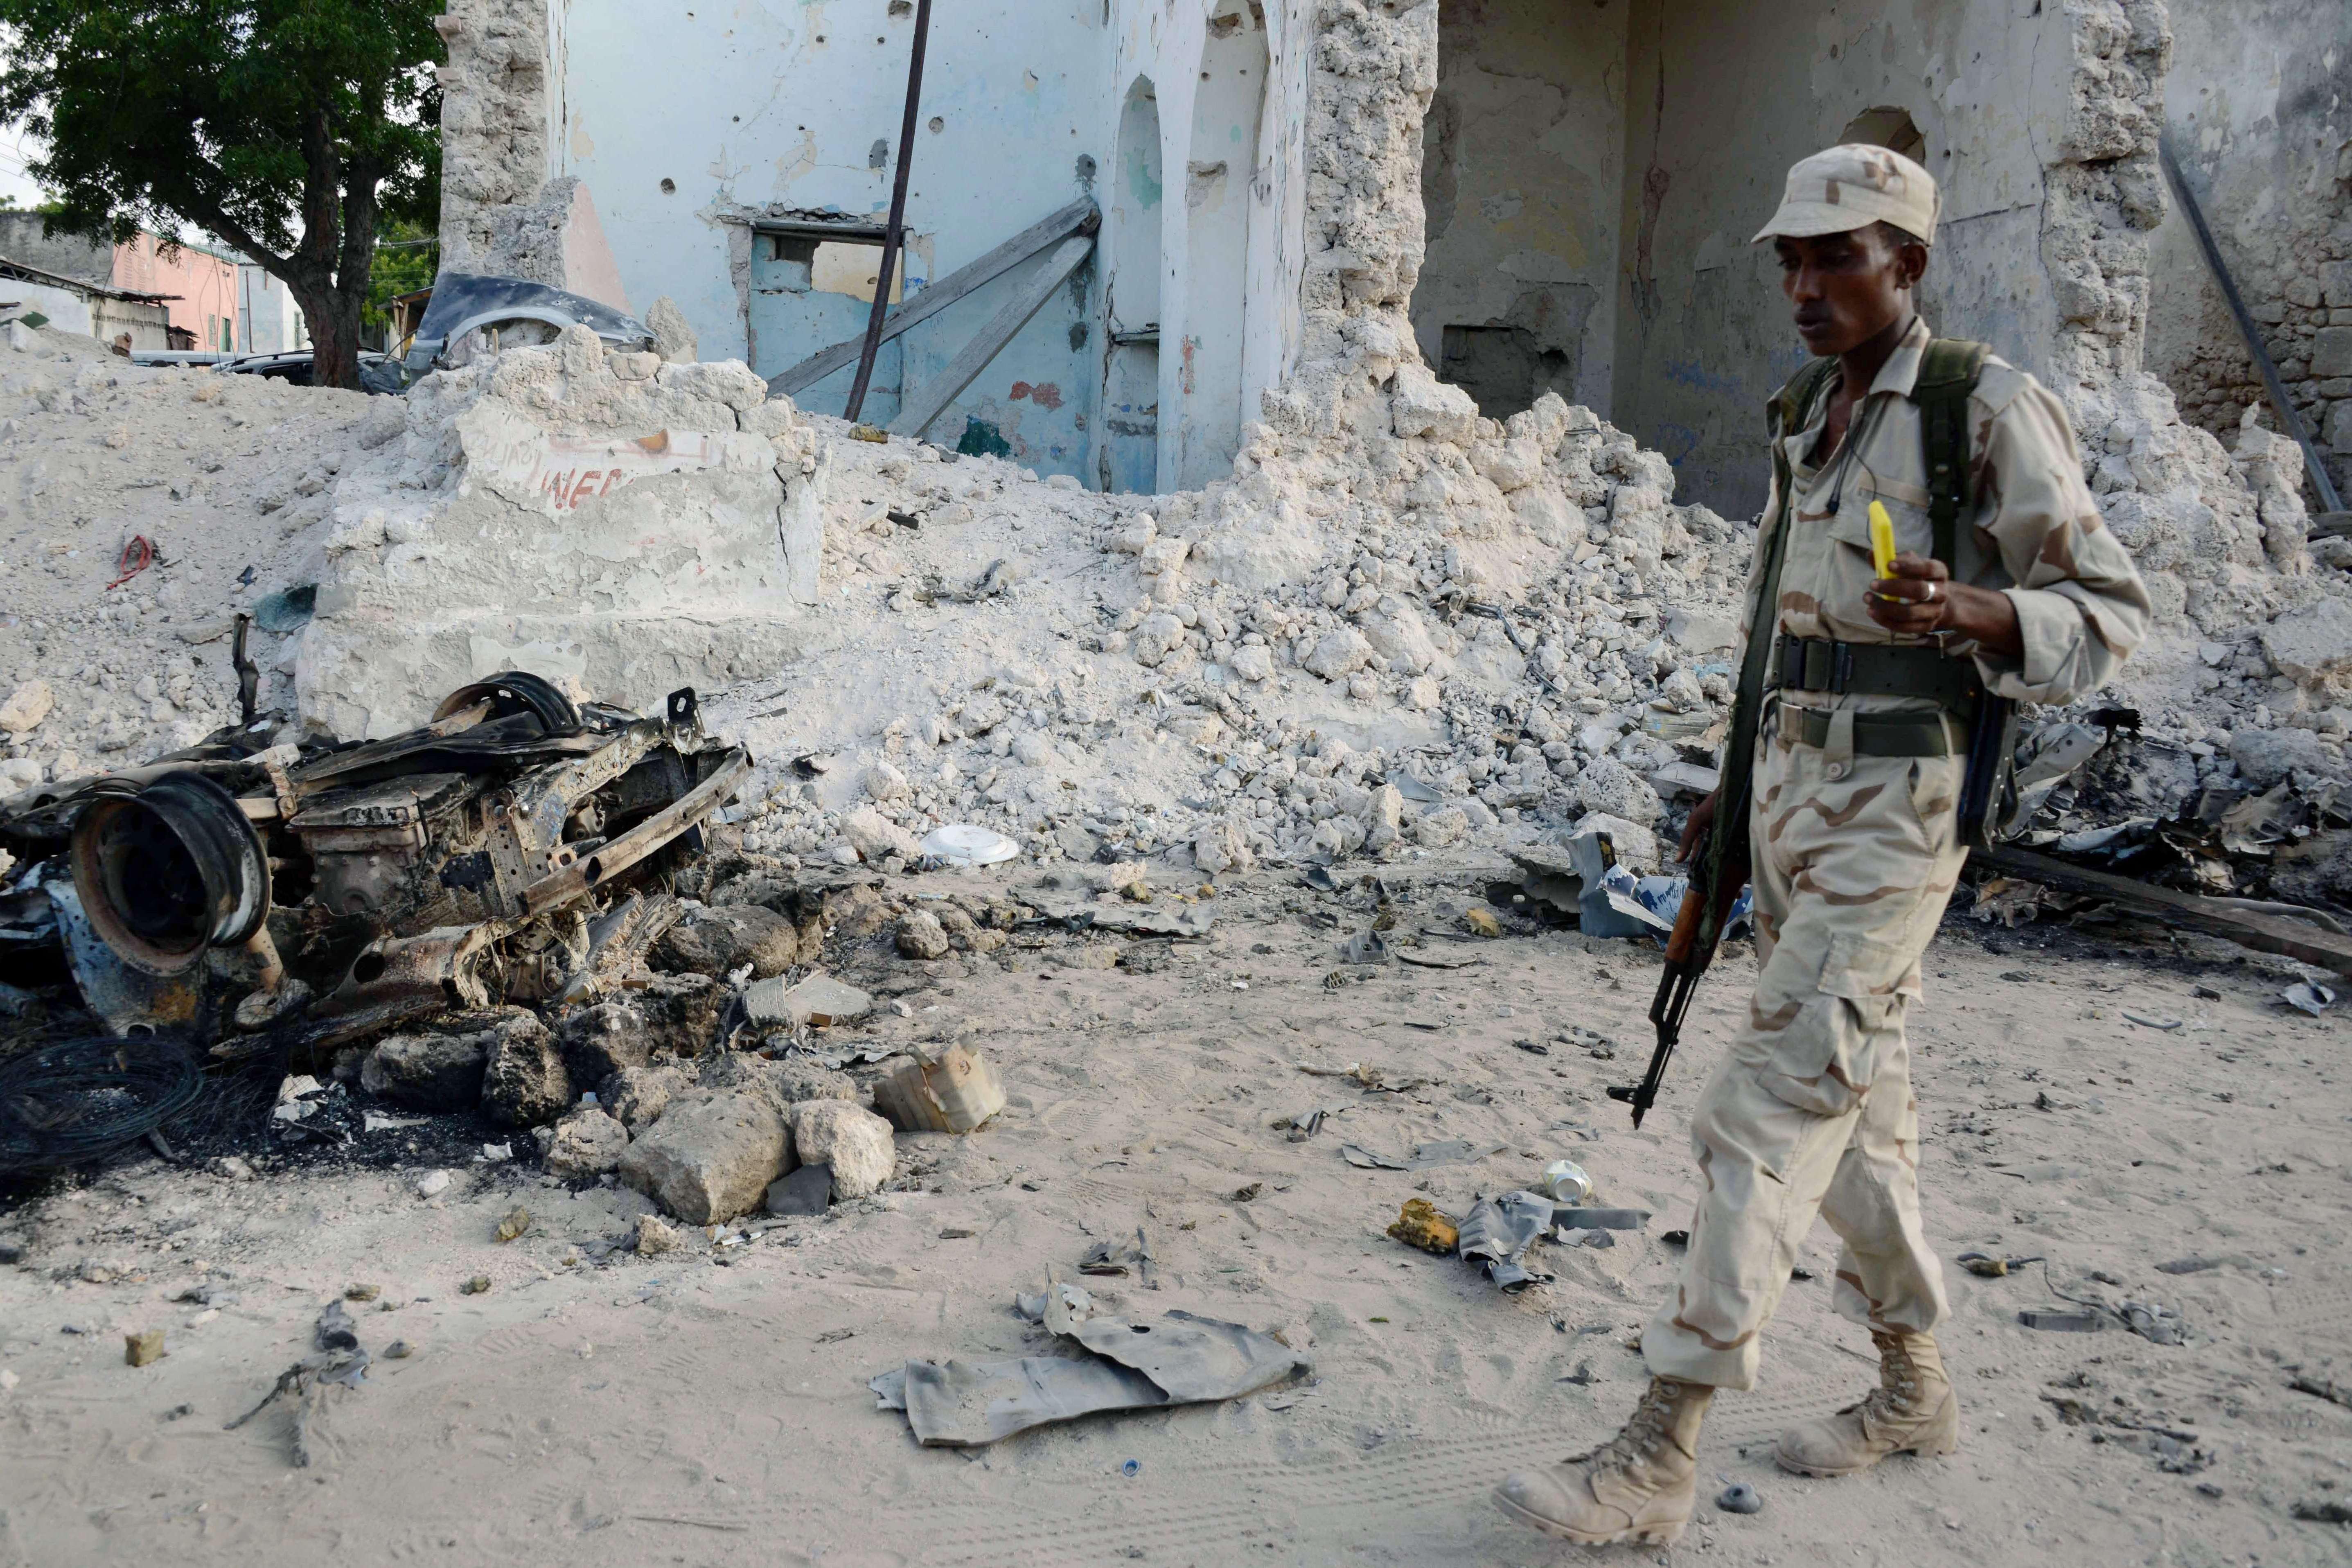 Somalia militant attacks intensify